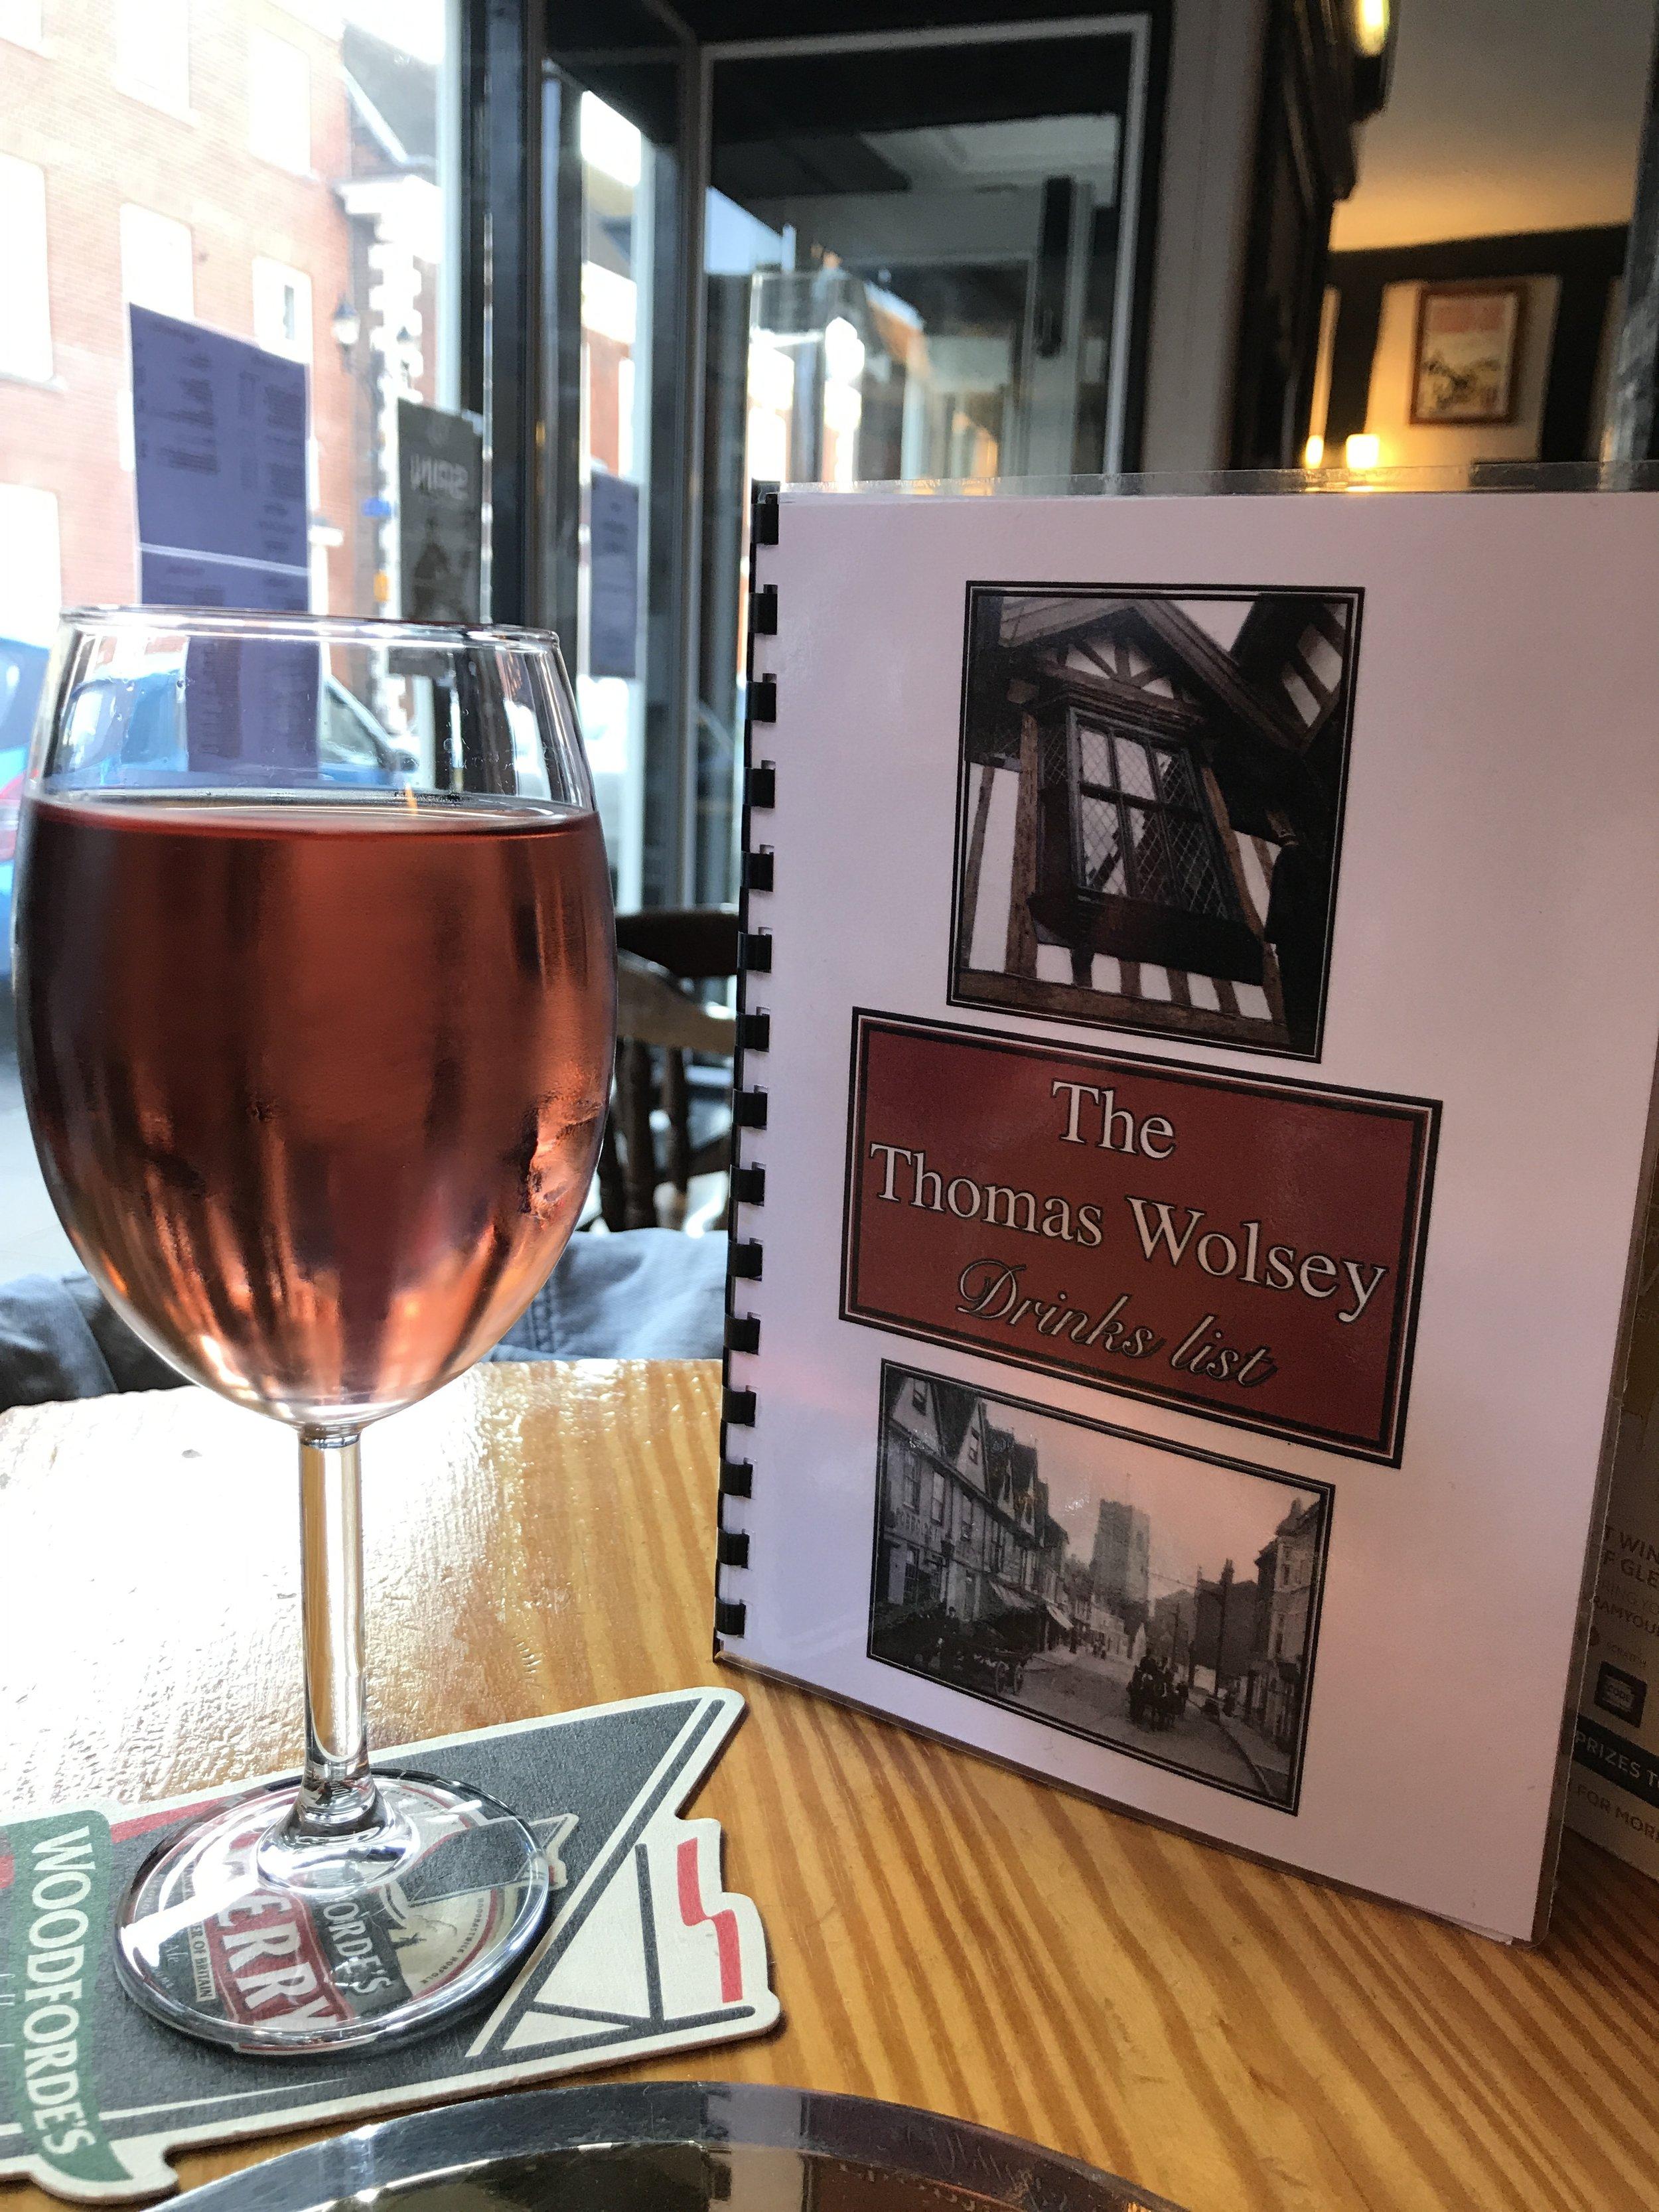 rose wine, ipswich, thomas wolsey